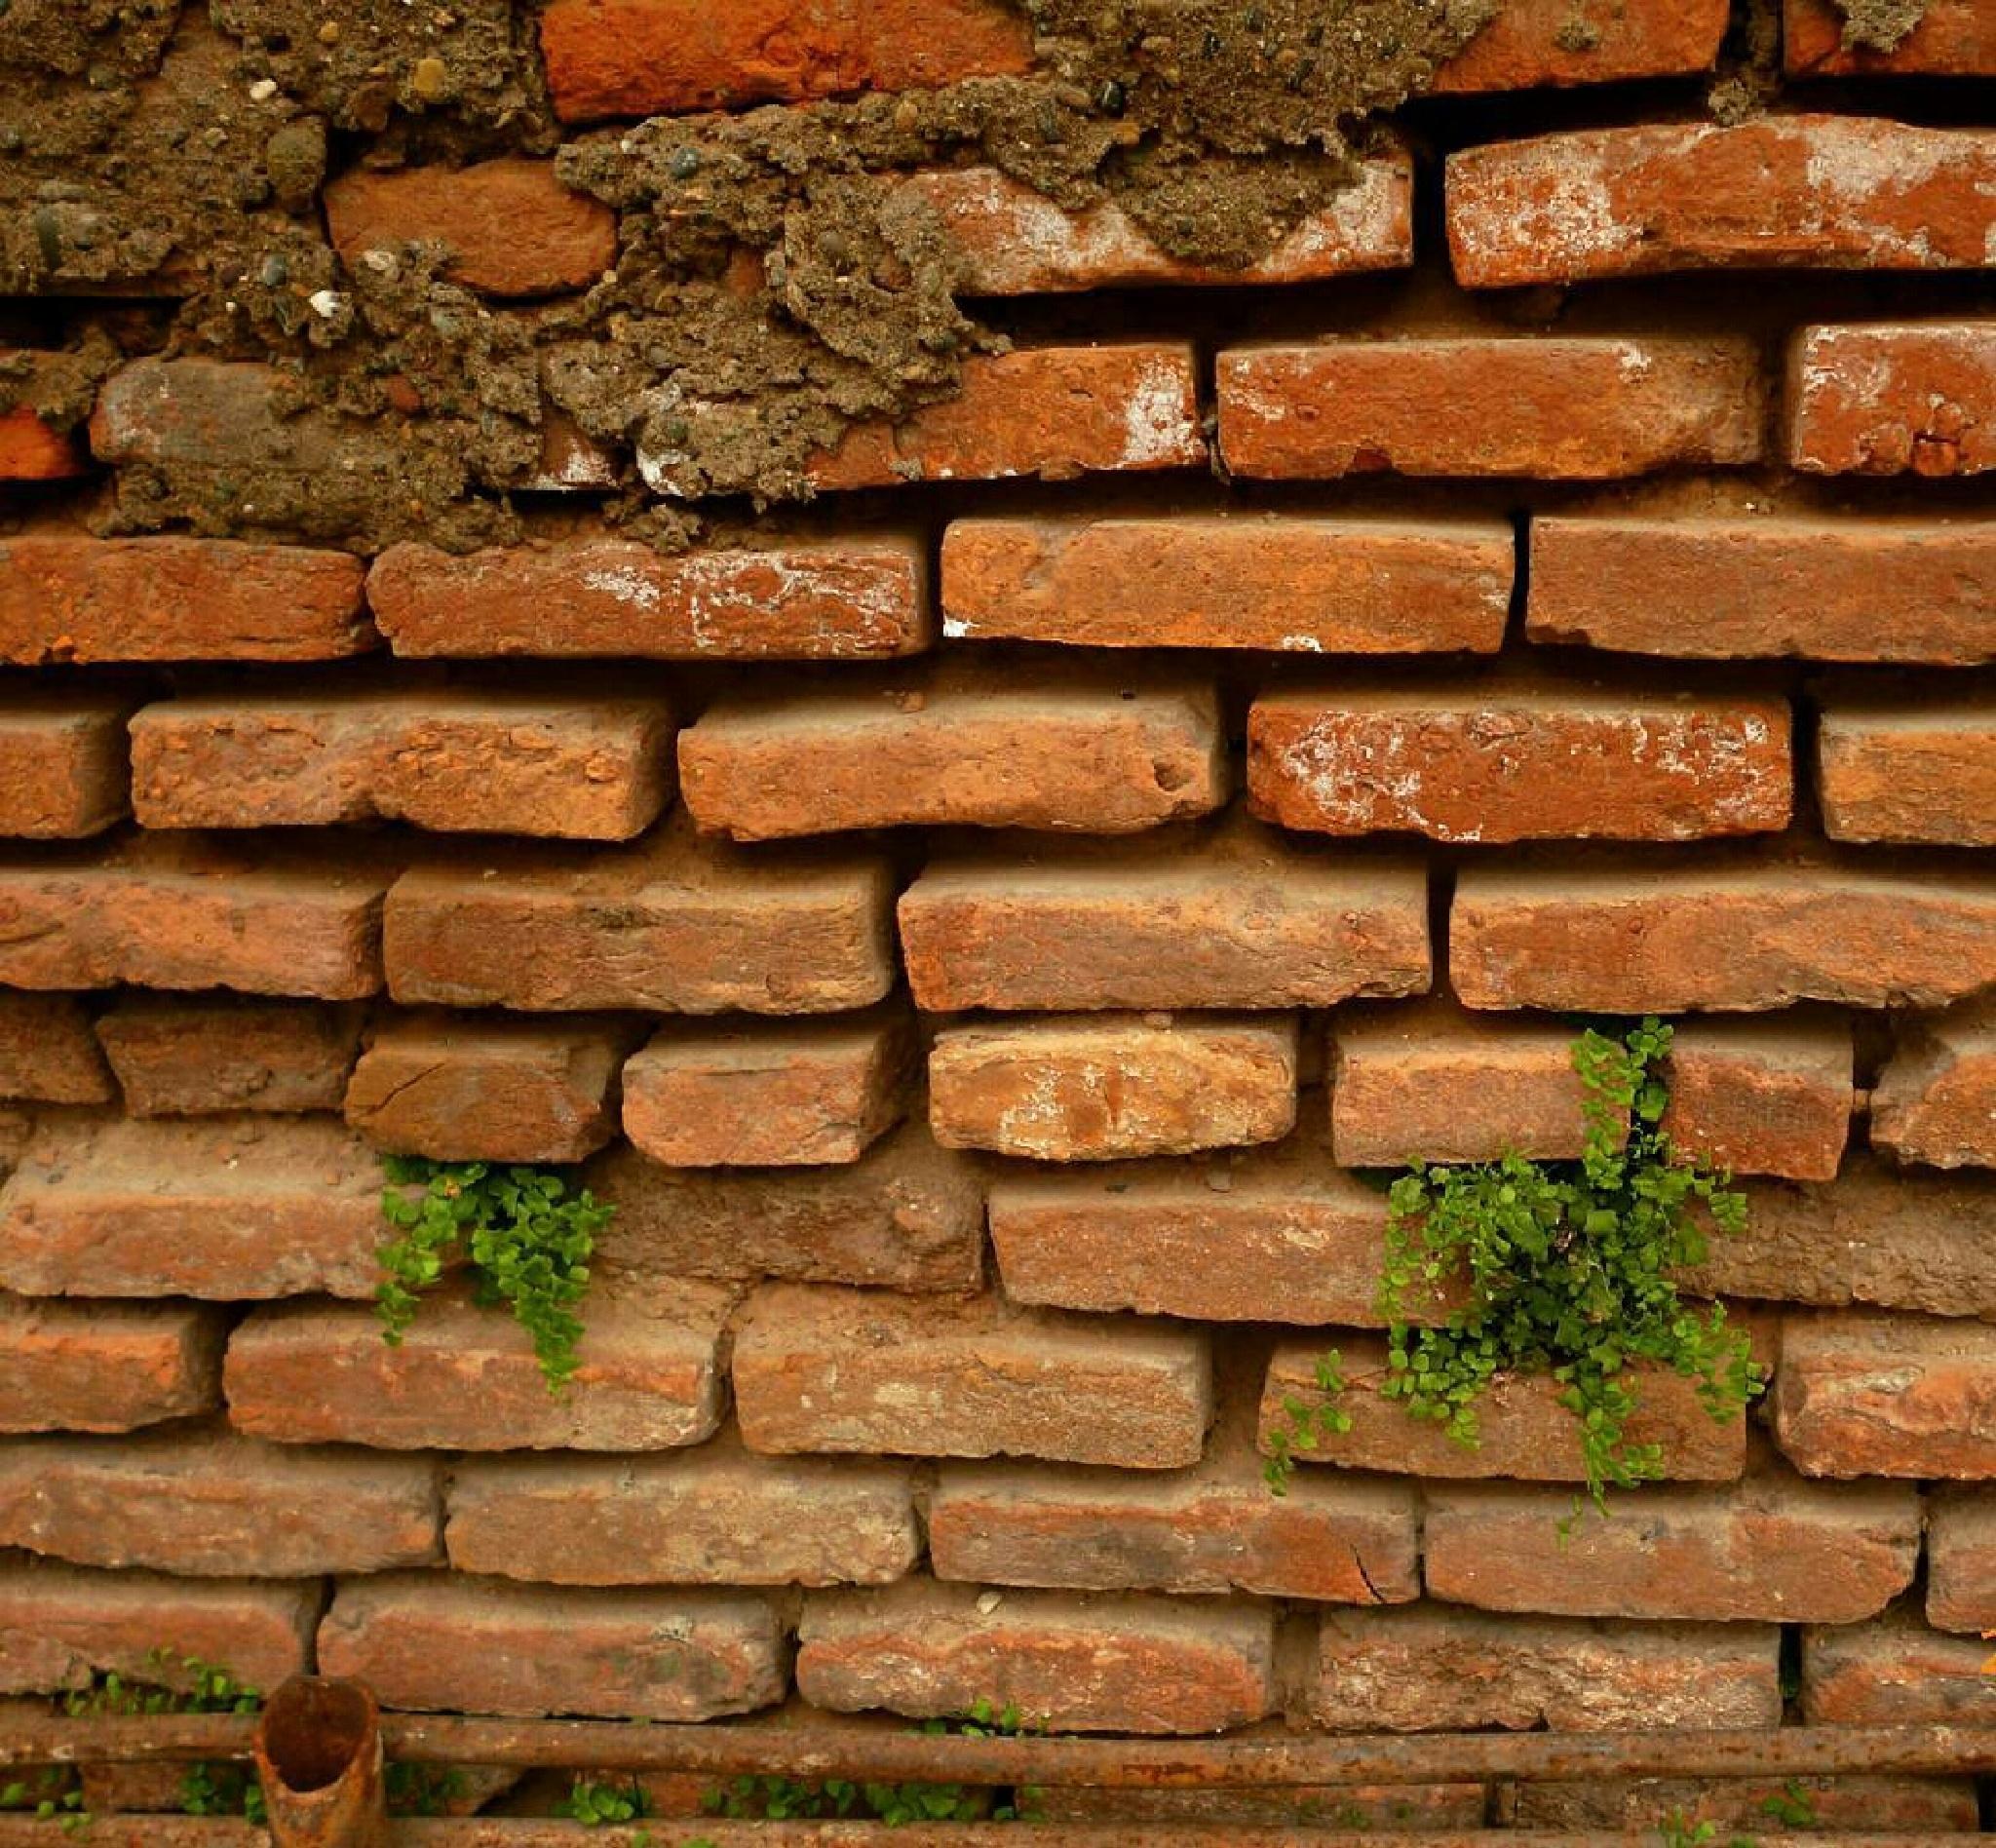 brick wall by Fateme.hp